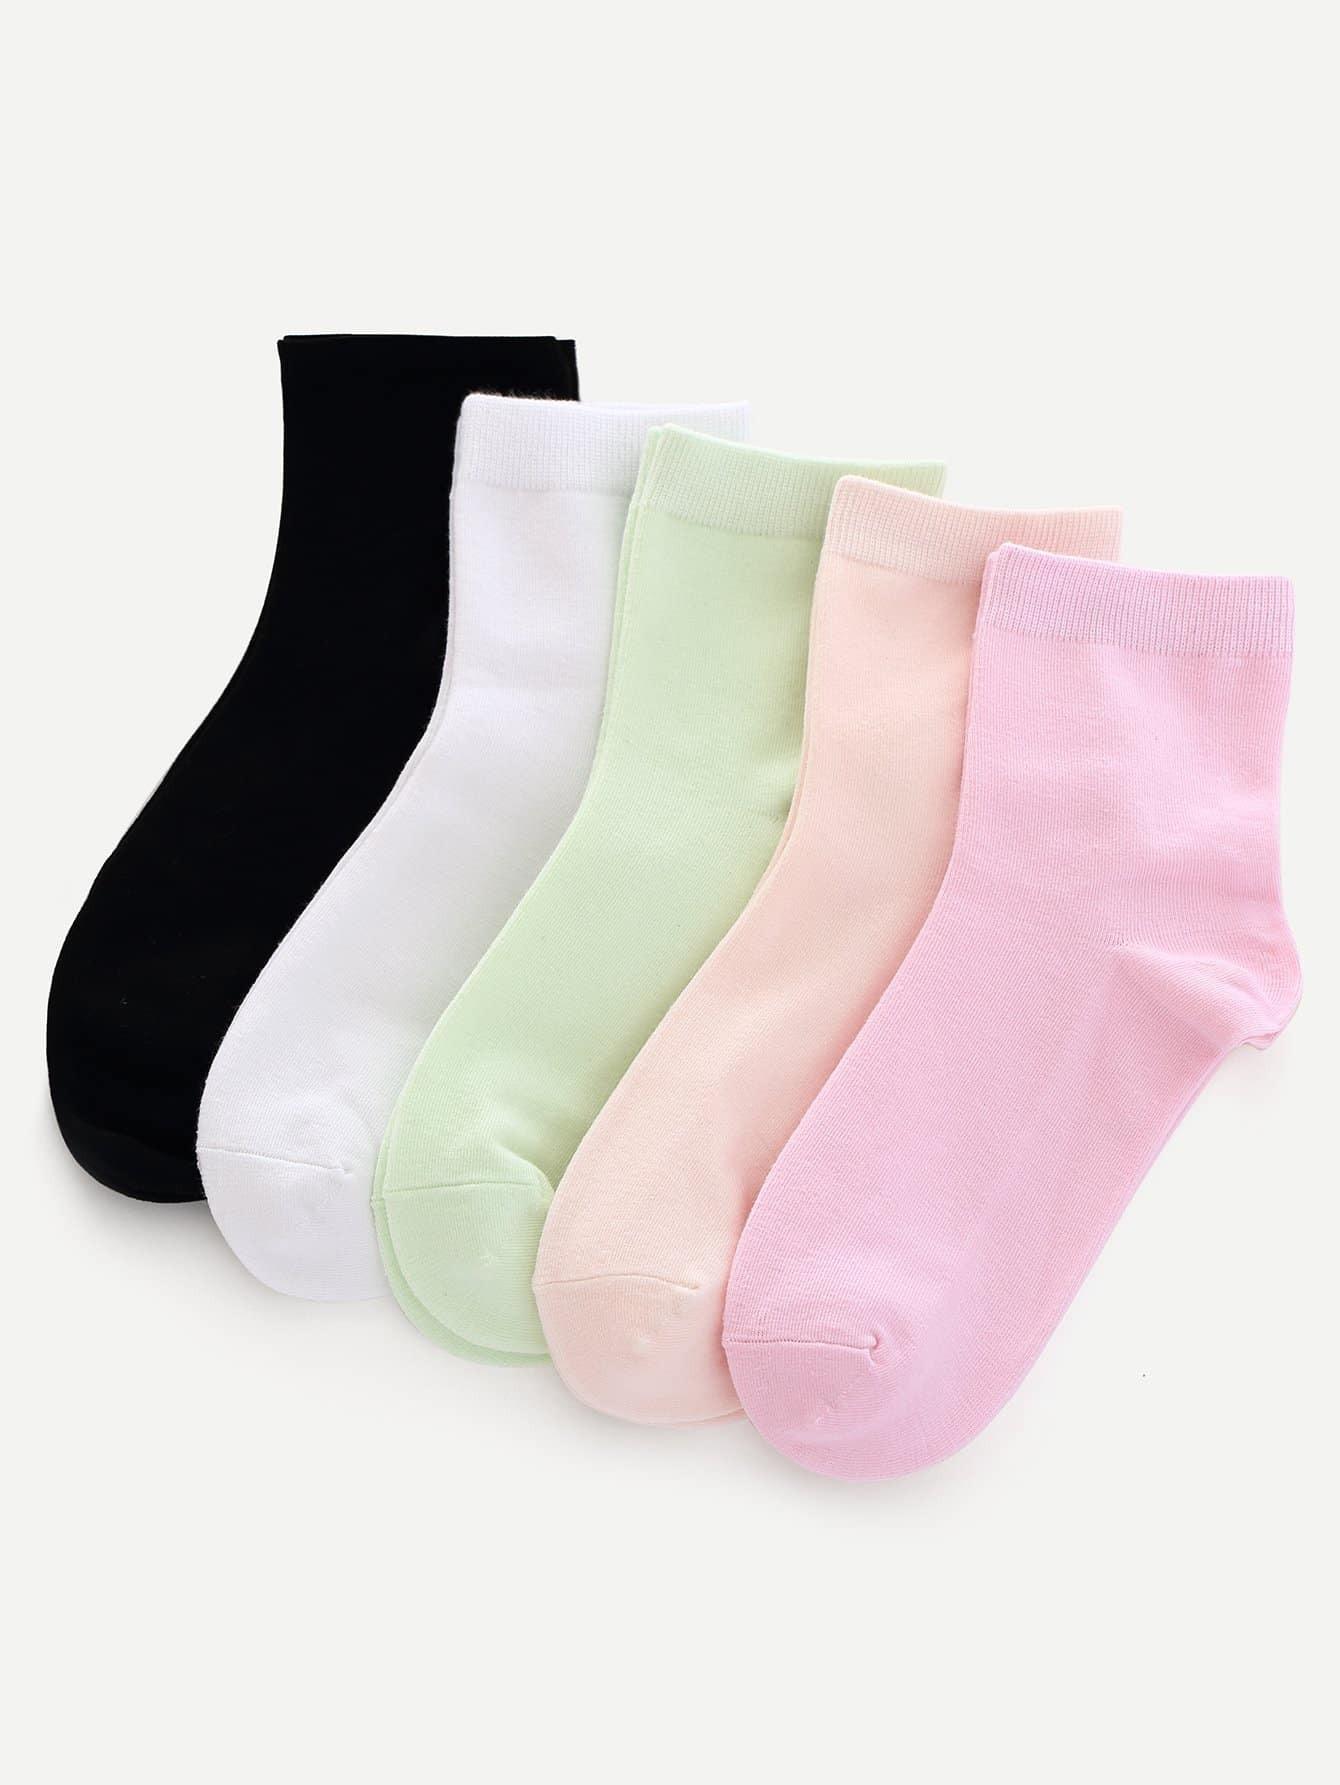 Einfarbige Socken 5 Paare